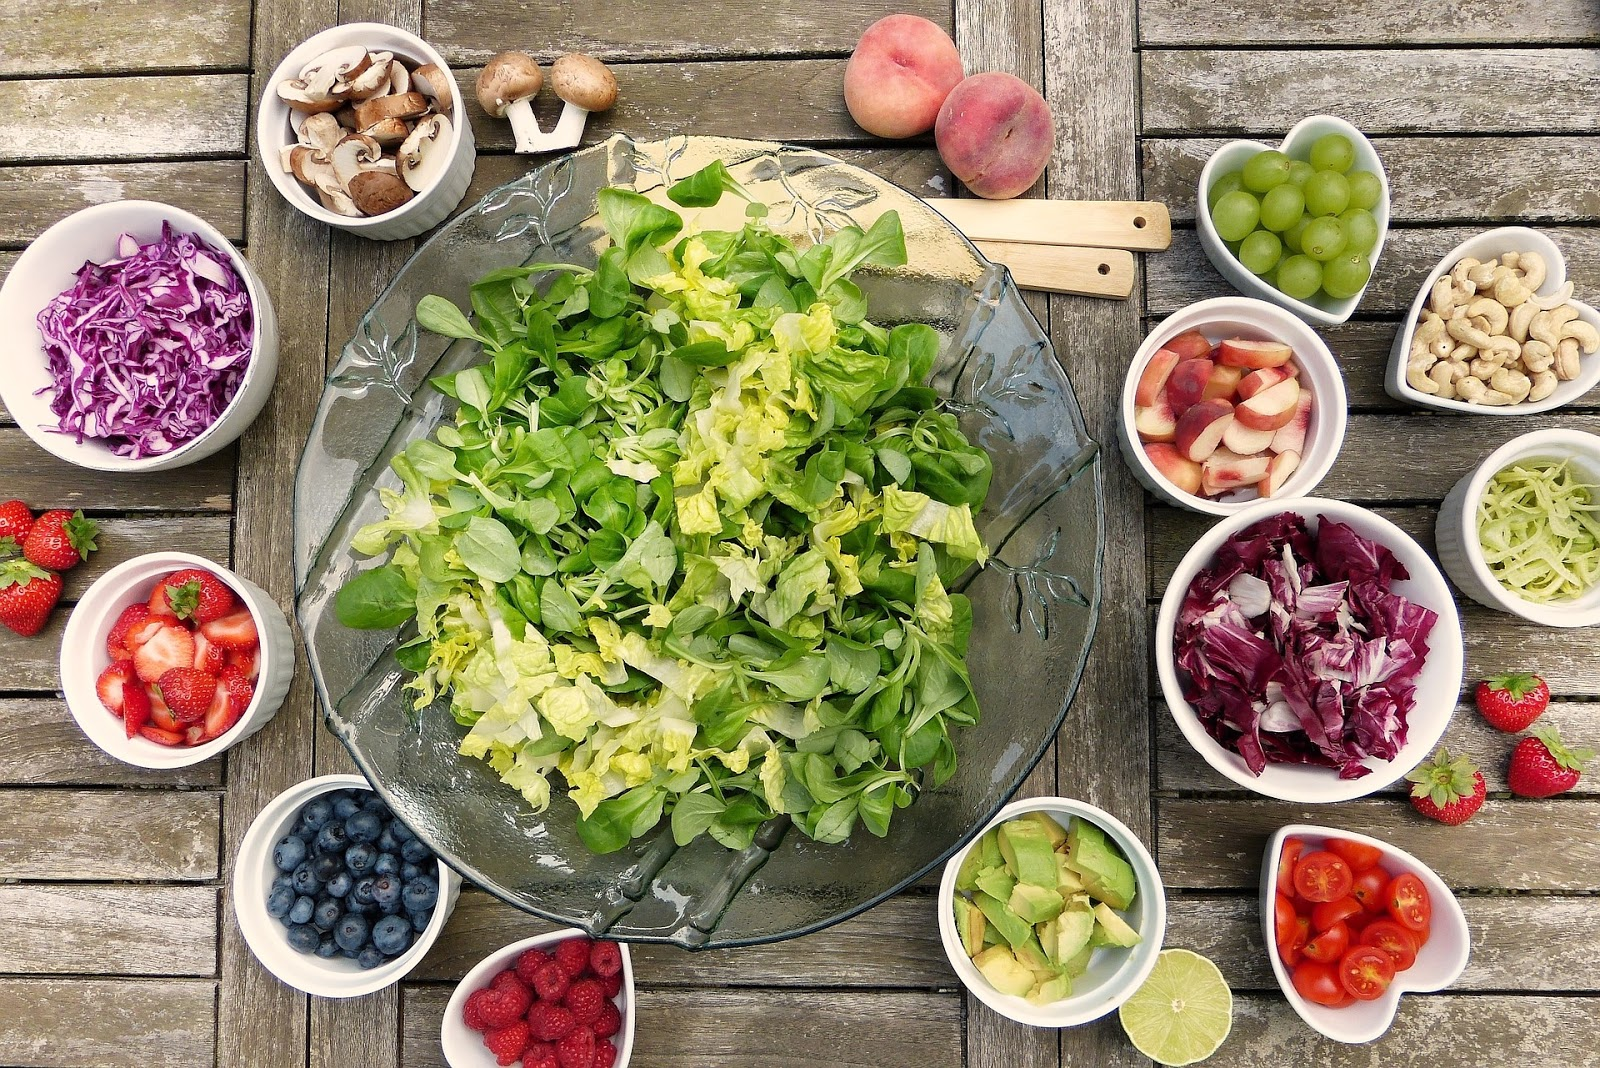 Salad and berries, food rich in vitamins